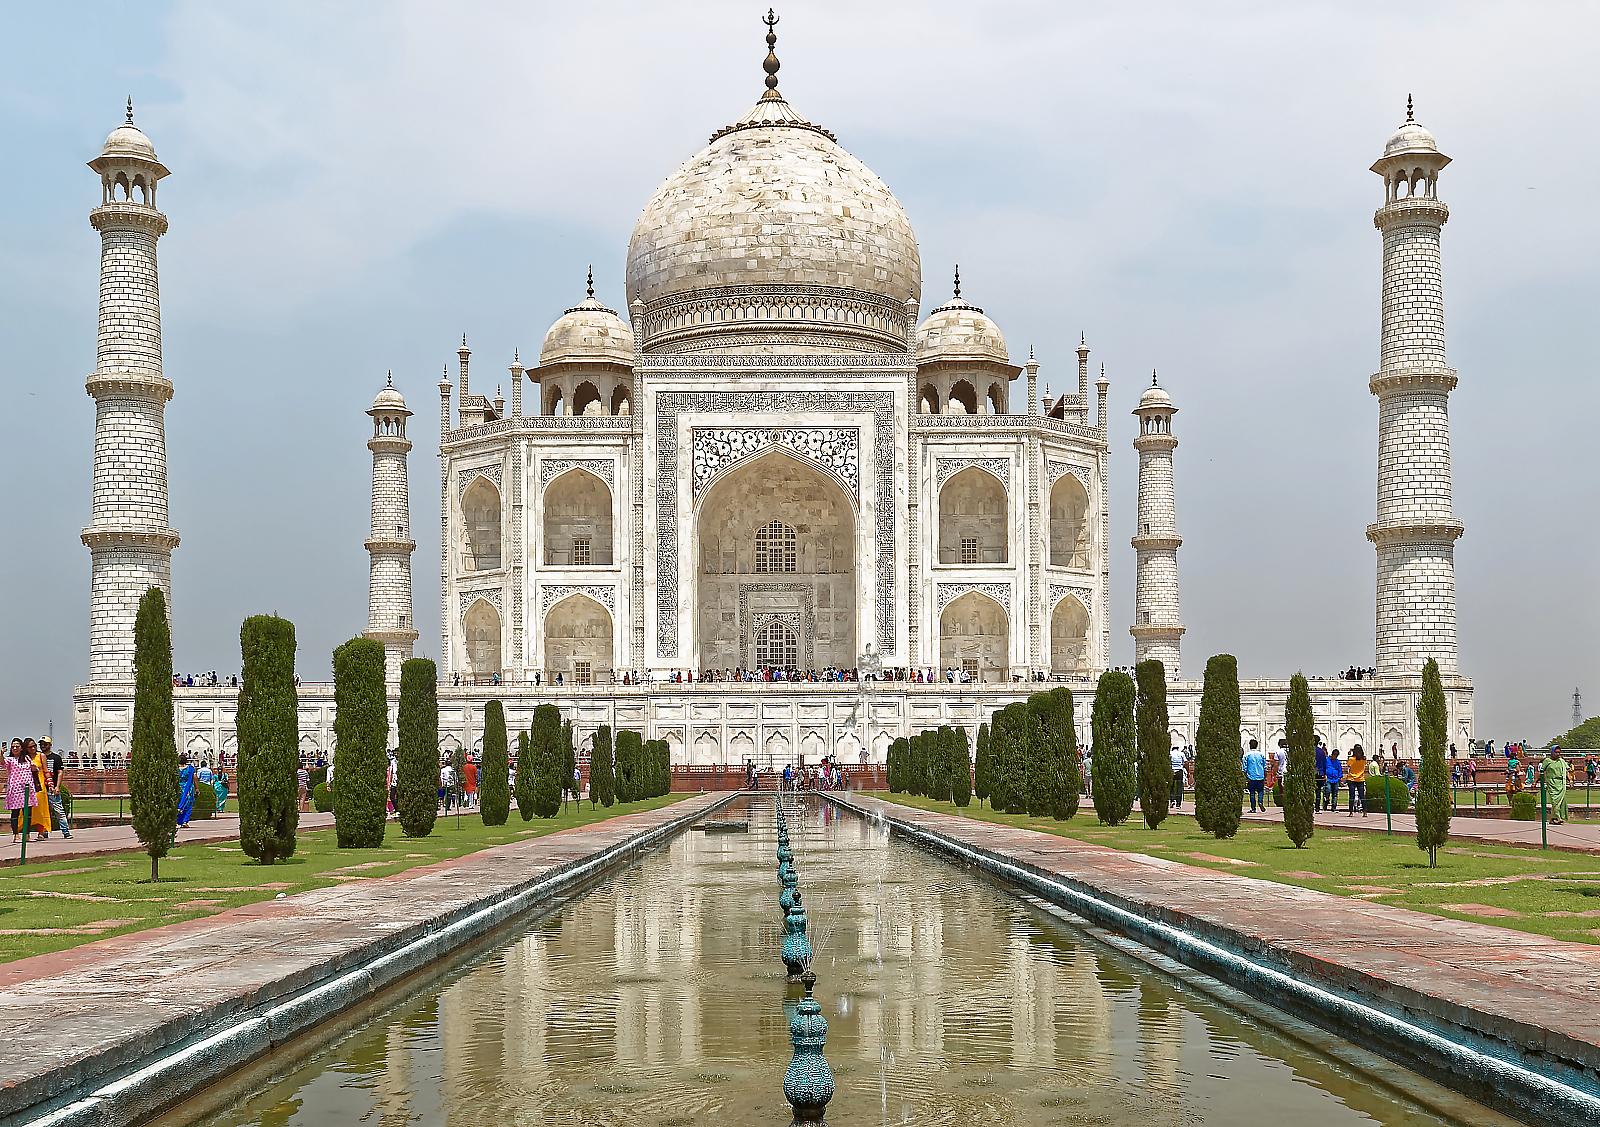 Taj Mahal © Chris Glasbey